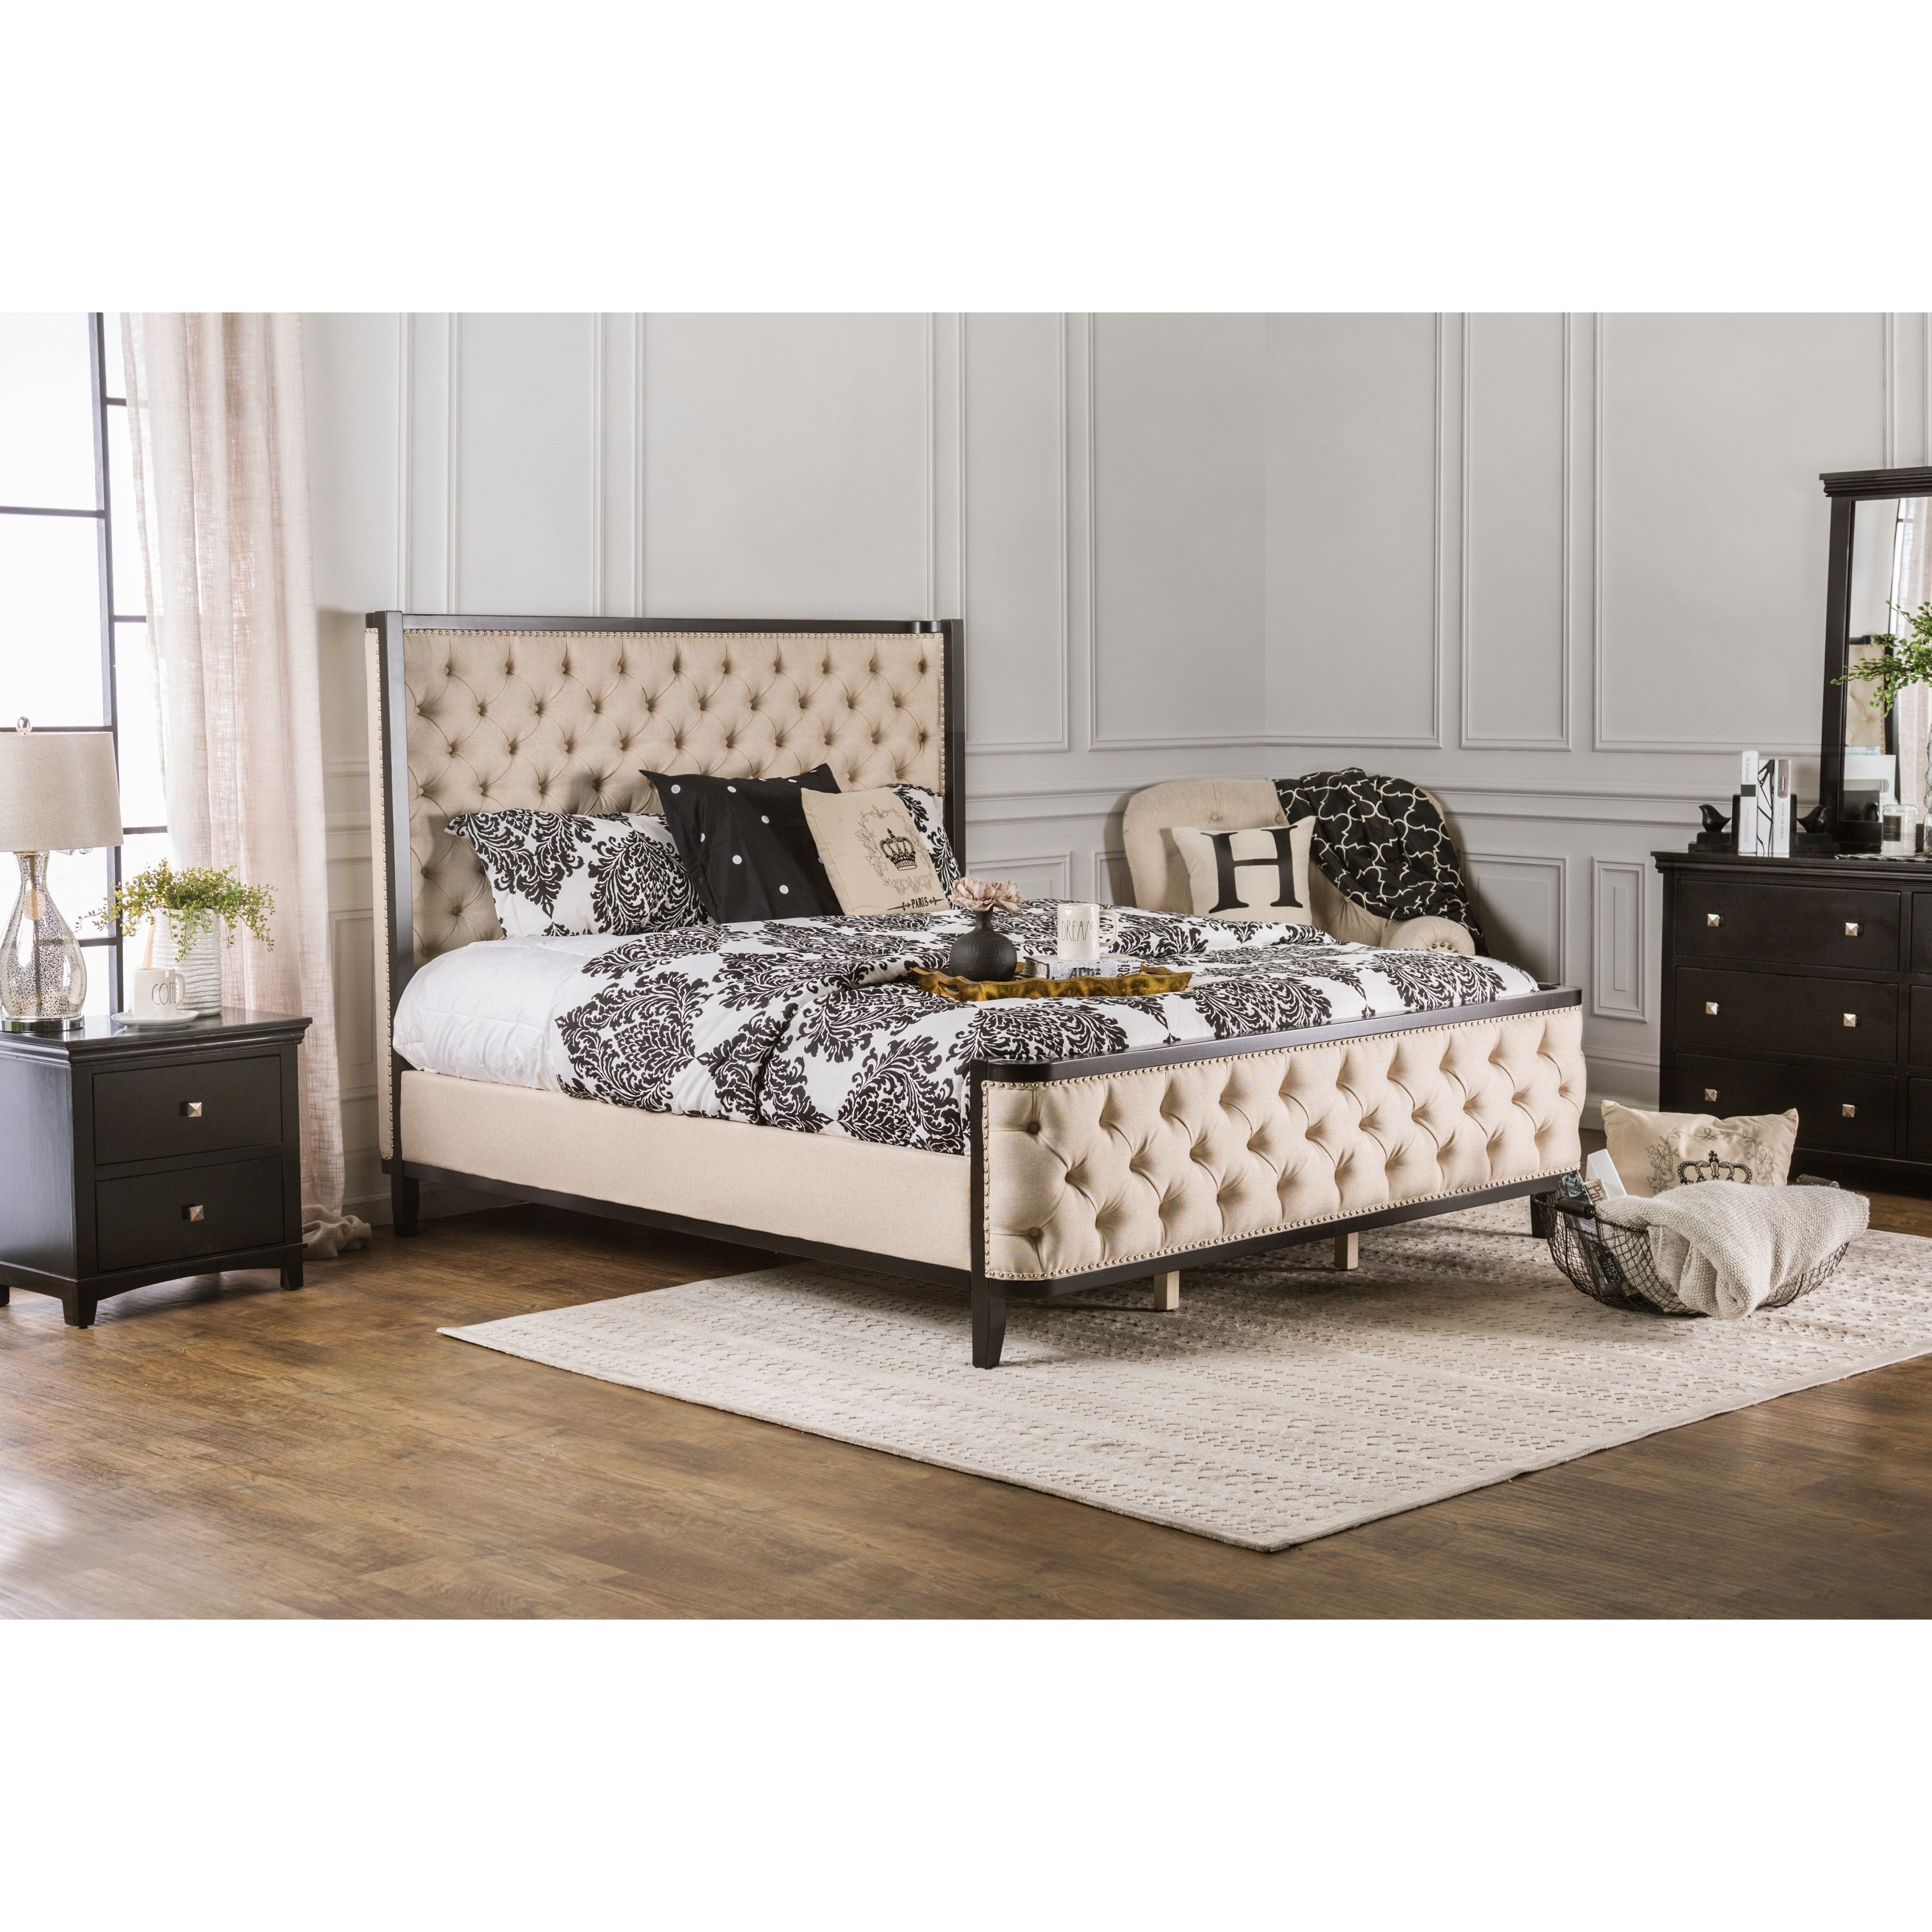 furniture of america marisa elegant two tone wingback bed free